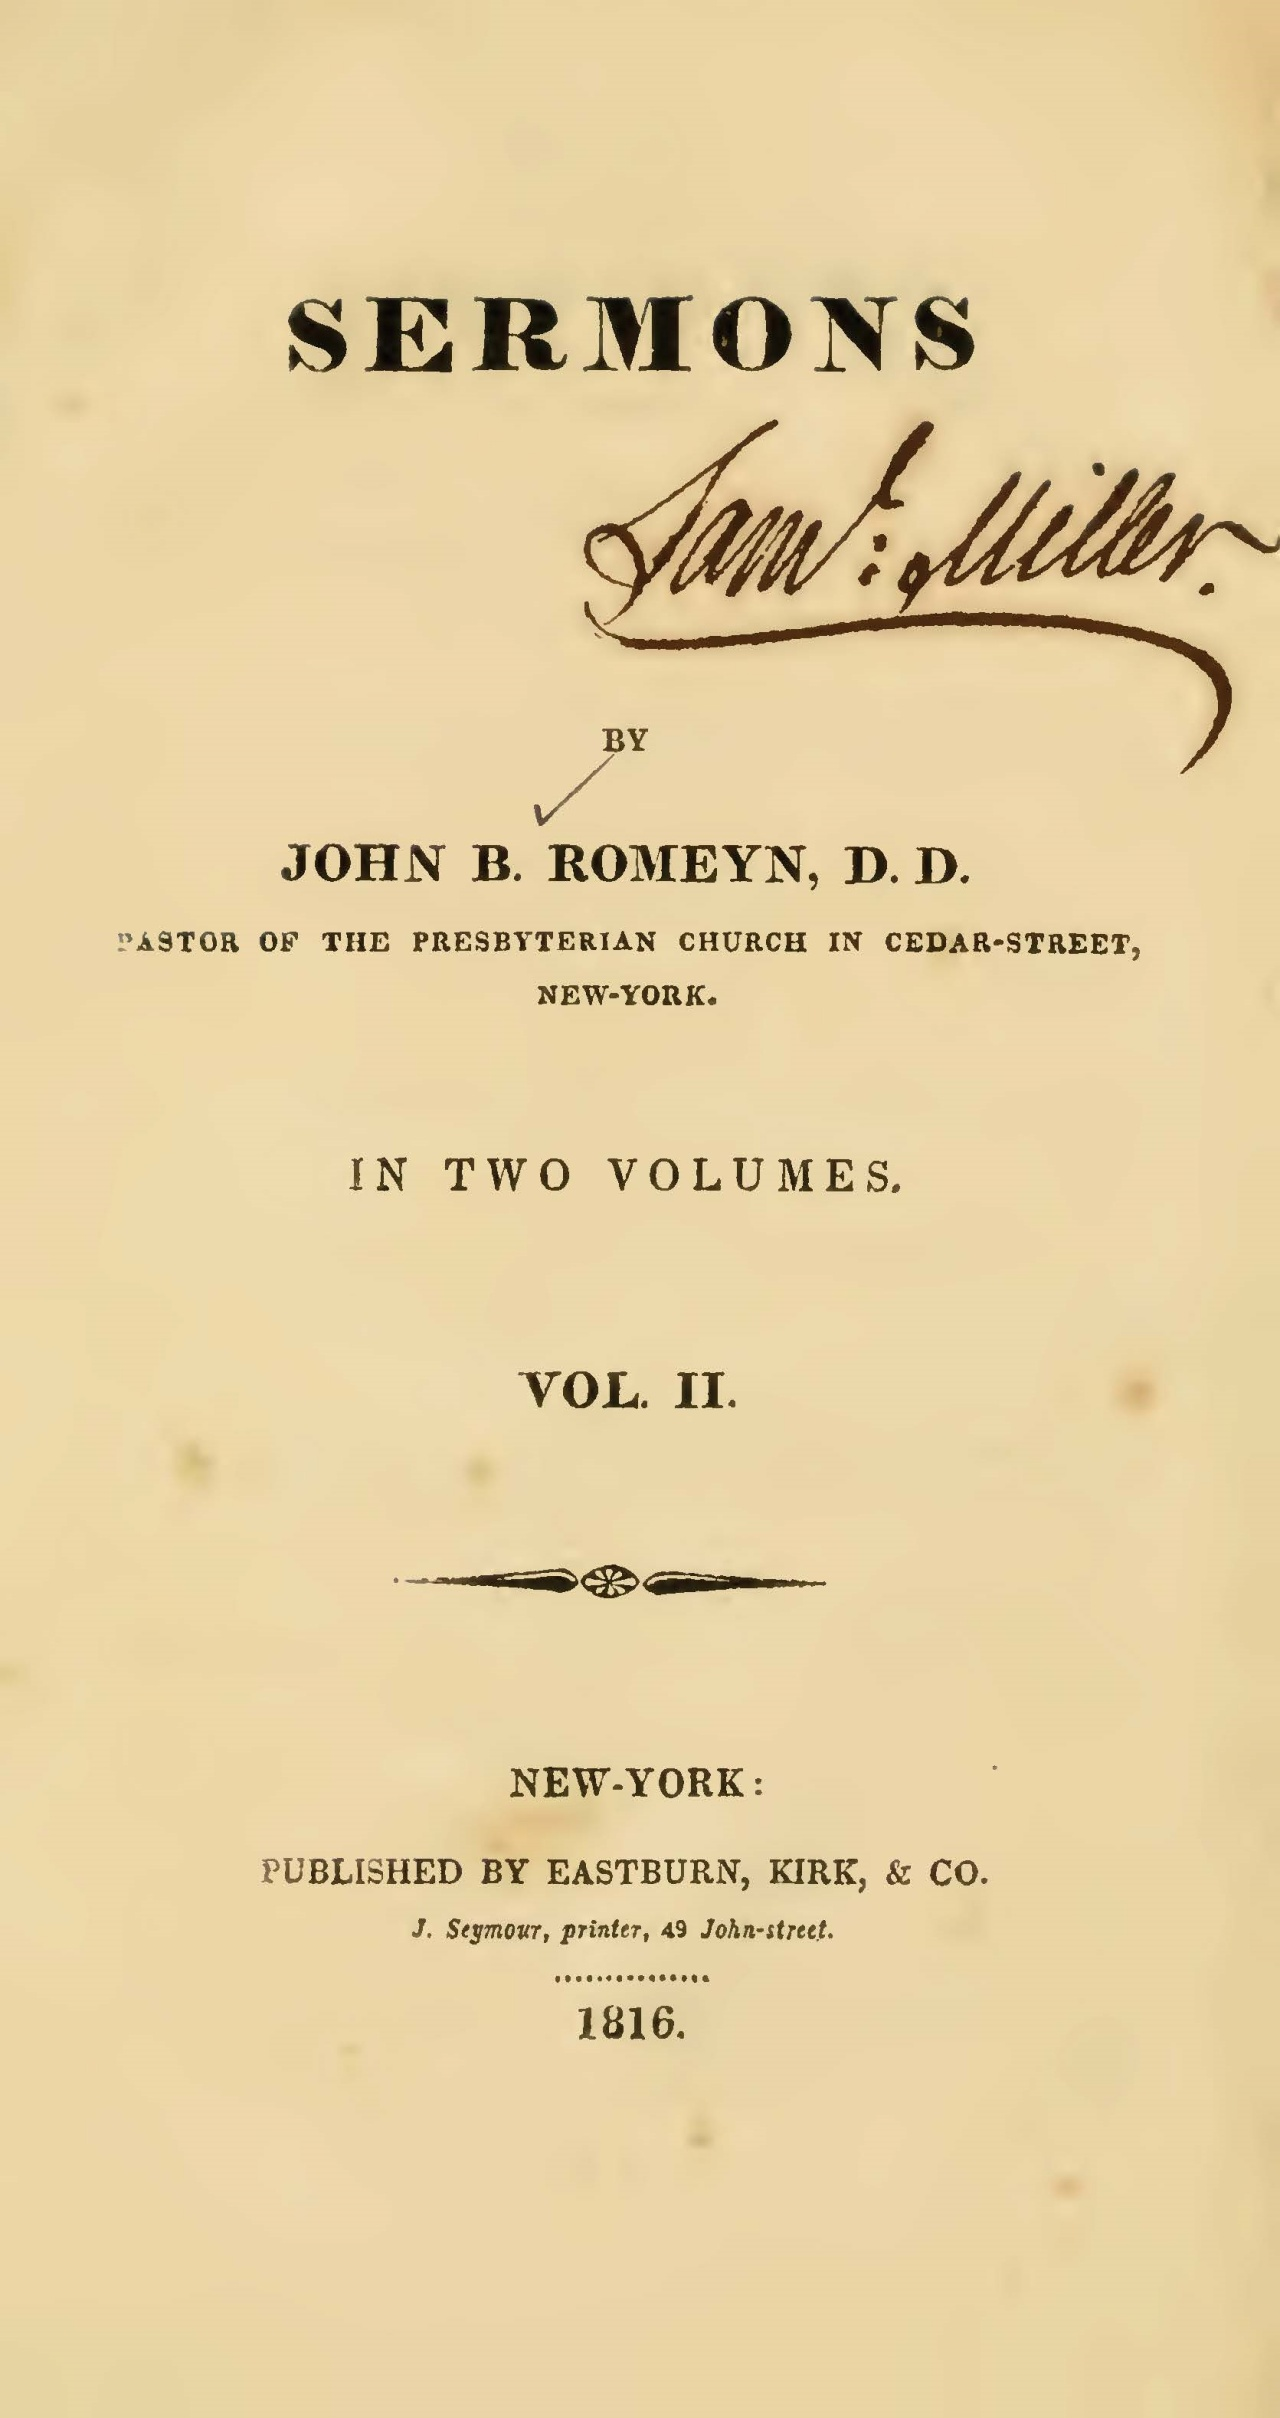 Romeyn, John Brodhead, Sermons, Vol. 2 Title Page.jpg